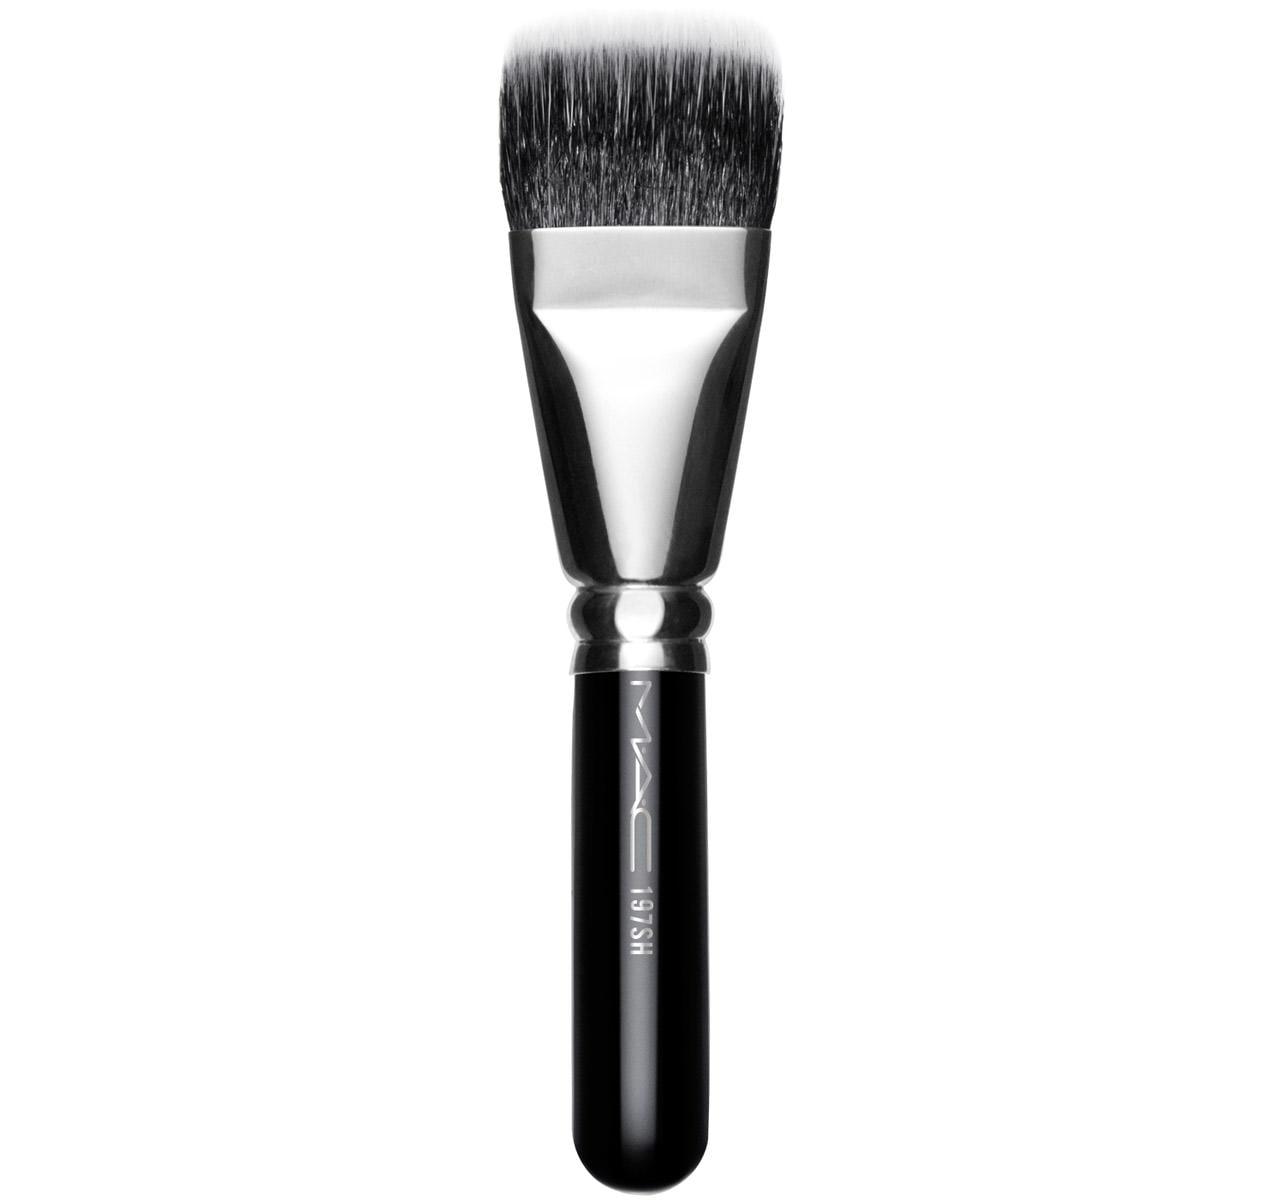 197 SH Duo Fibre Square Brush   MAC Cosmetics - Official Site